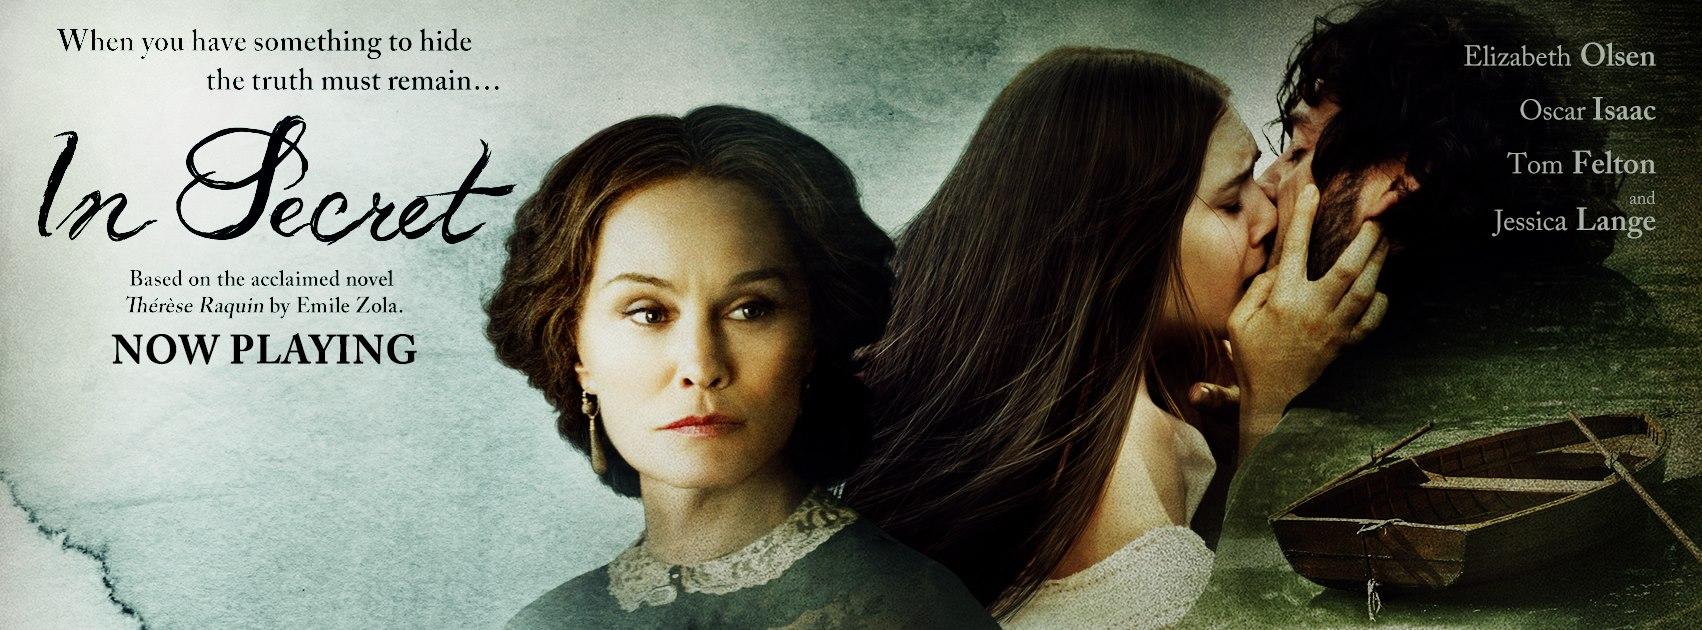 """In secret"" 2013 – film na motywach historii Emila Zoli"